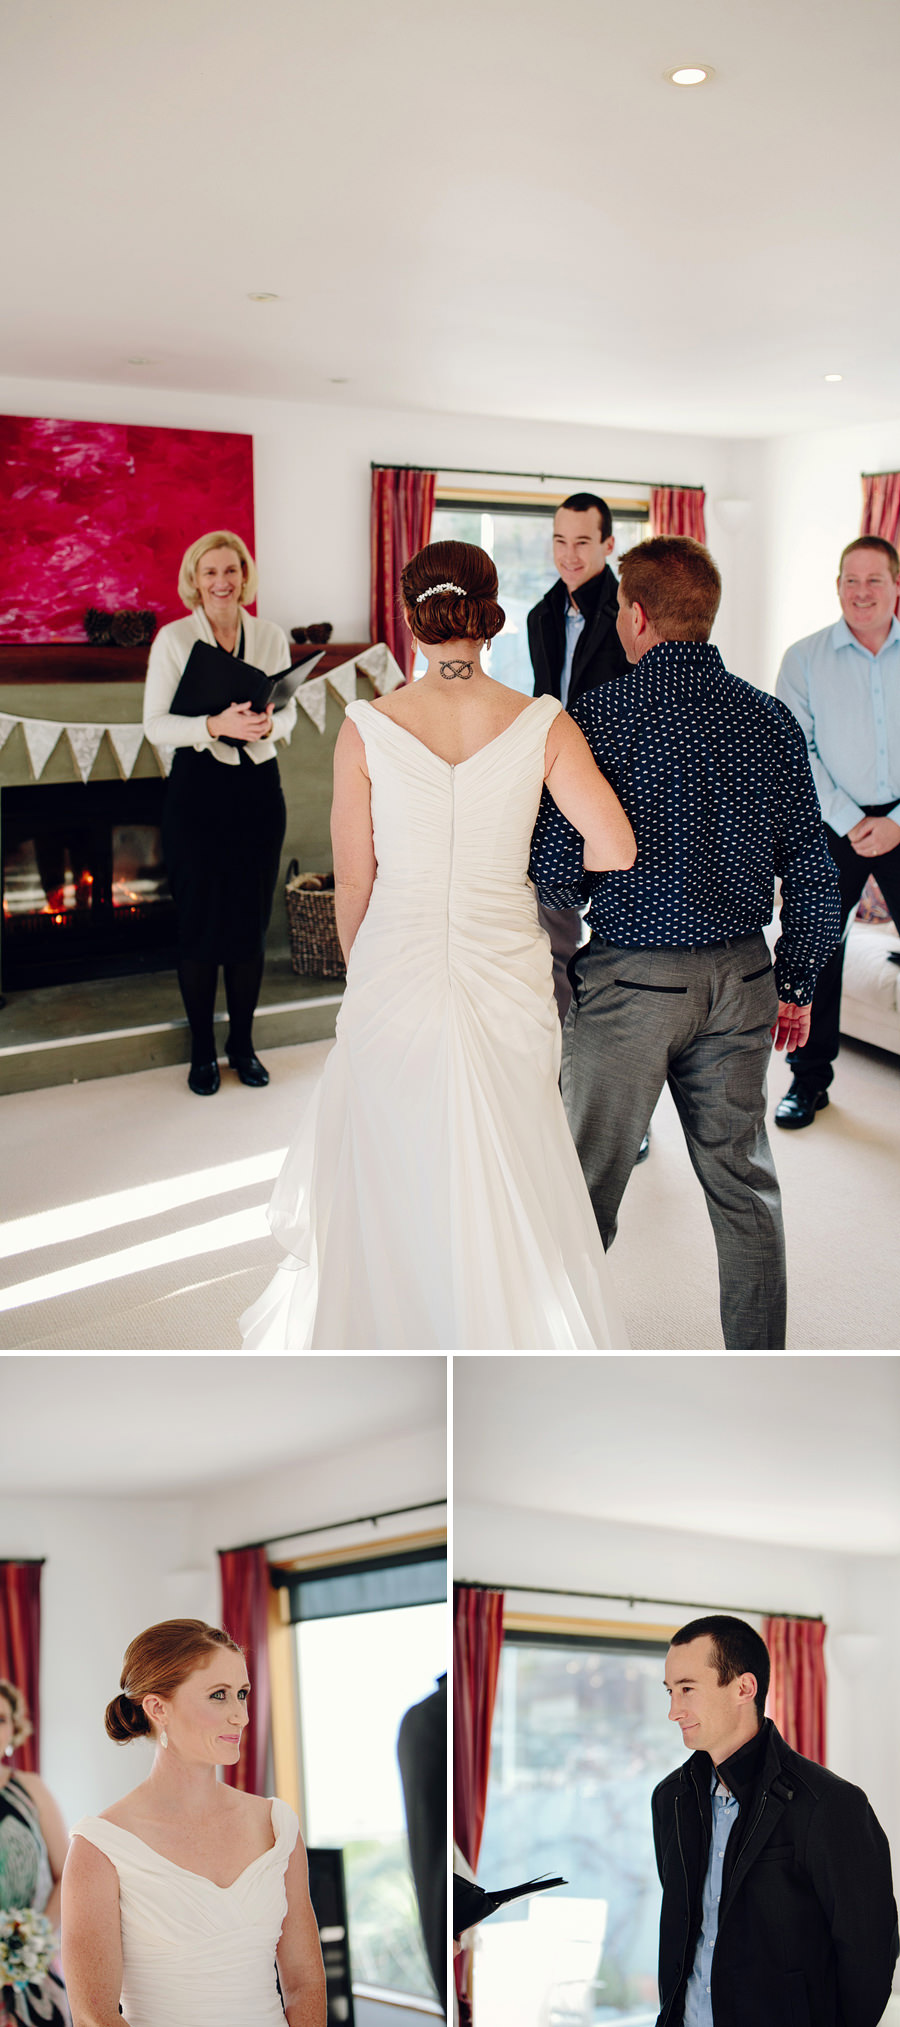 Shambala Queenstown Wedding Photographer: Ceremony